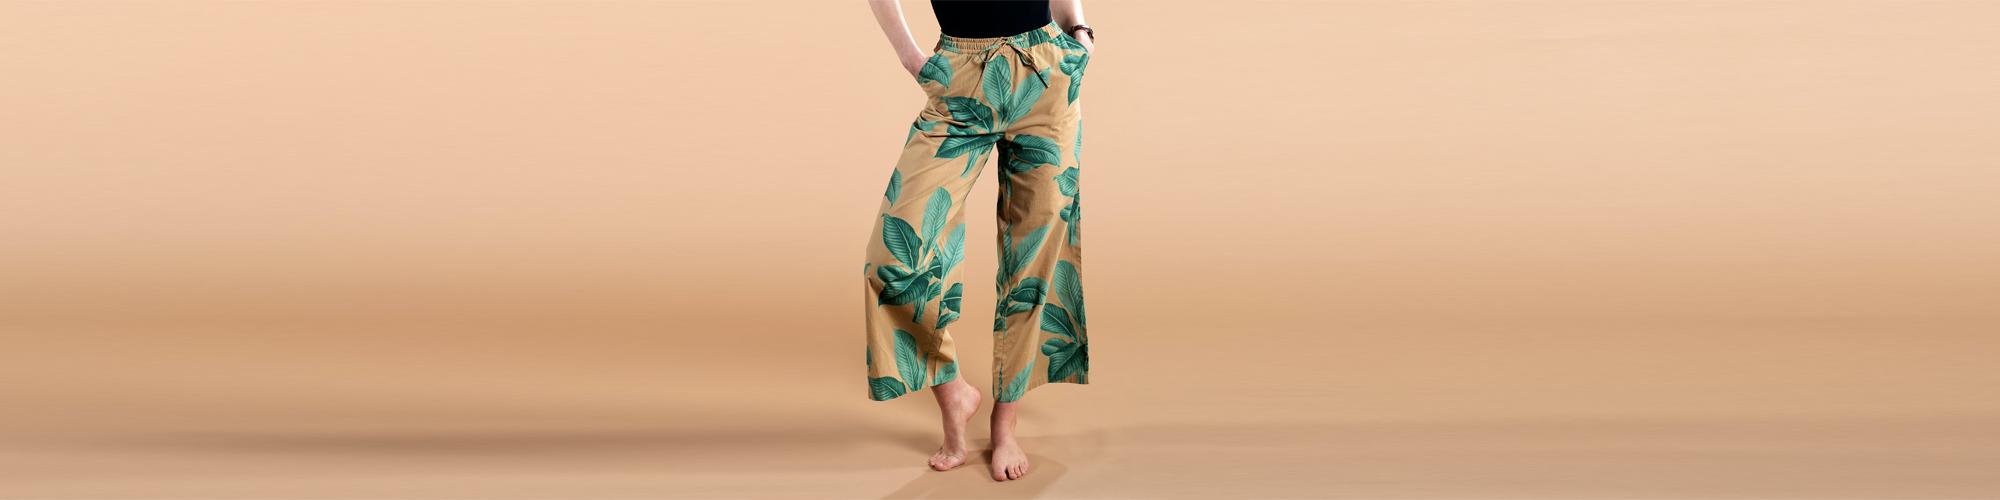 Women's Hosen & Shorts